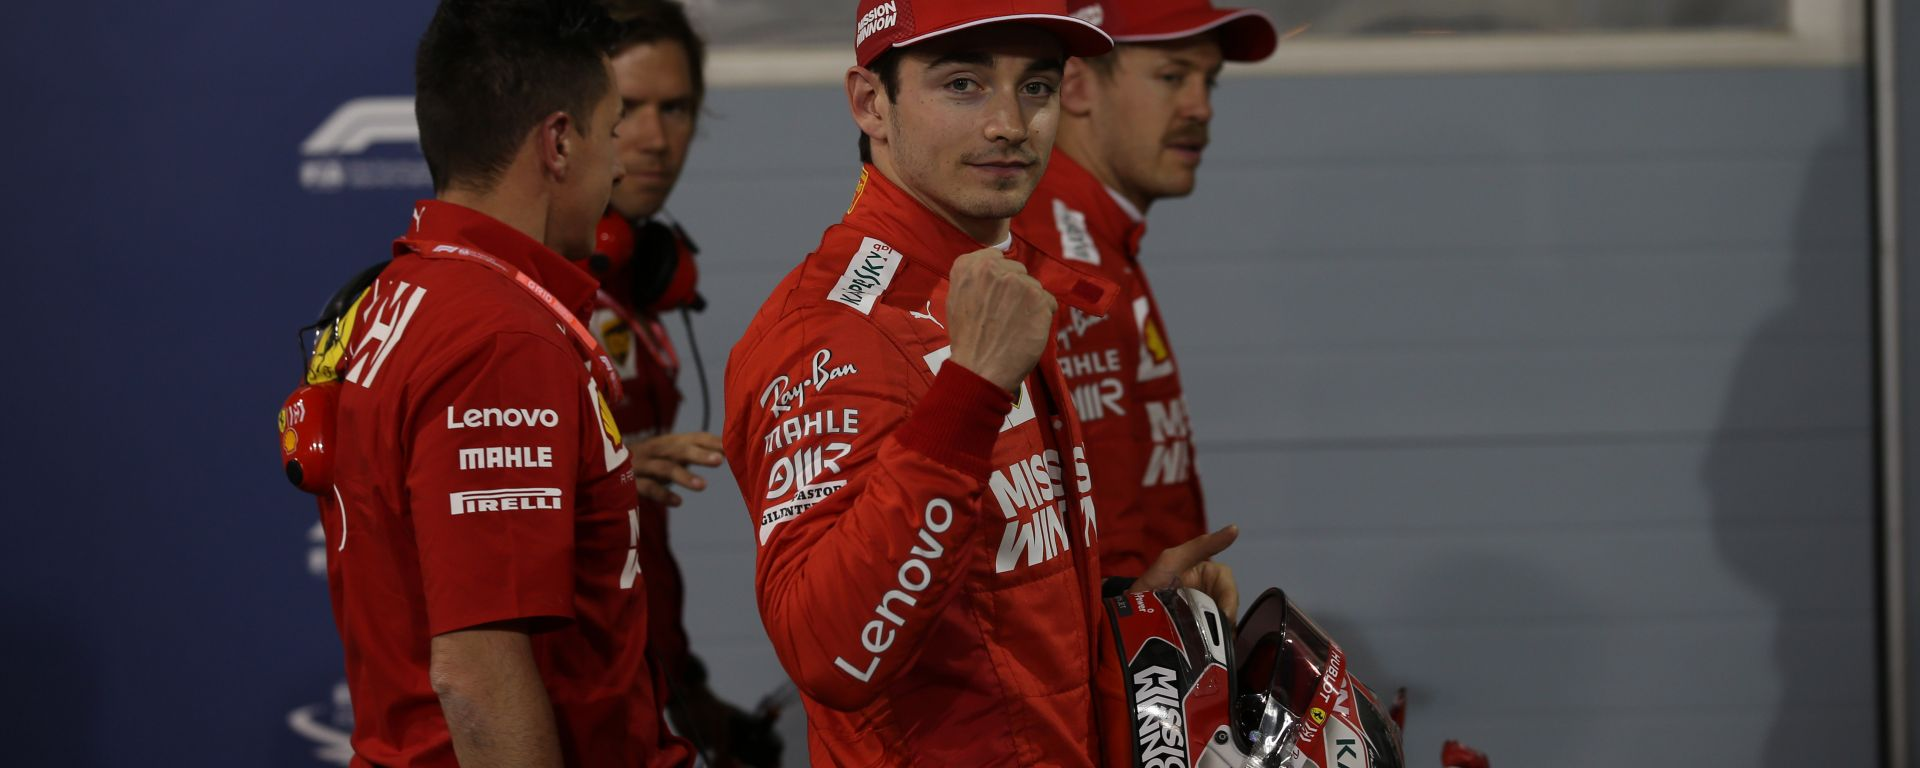 Leclerc esulta scortato da Vettel in pit-lane